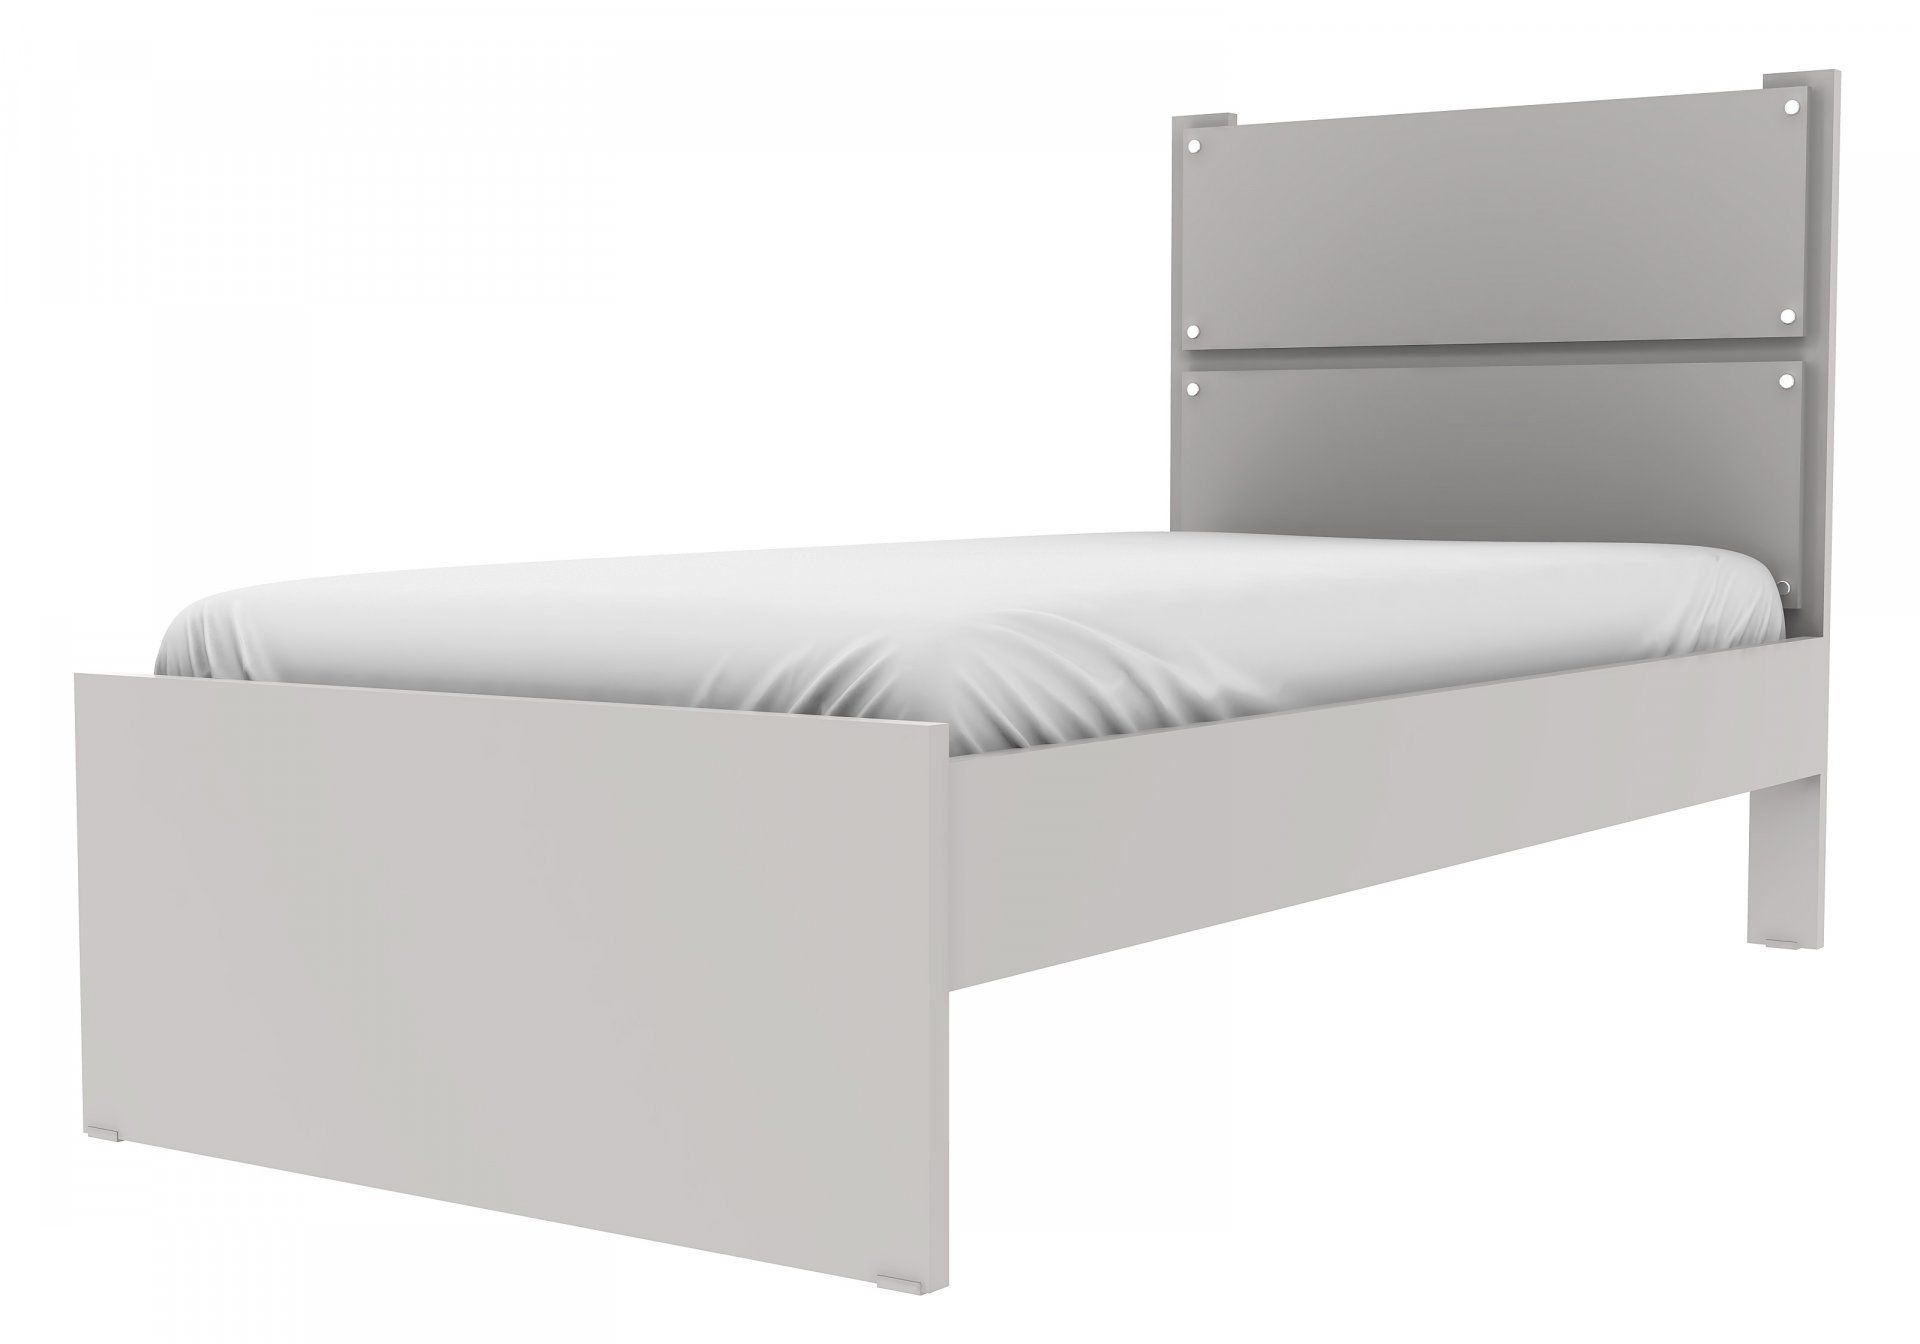 SLIM SINGLE BED